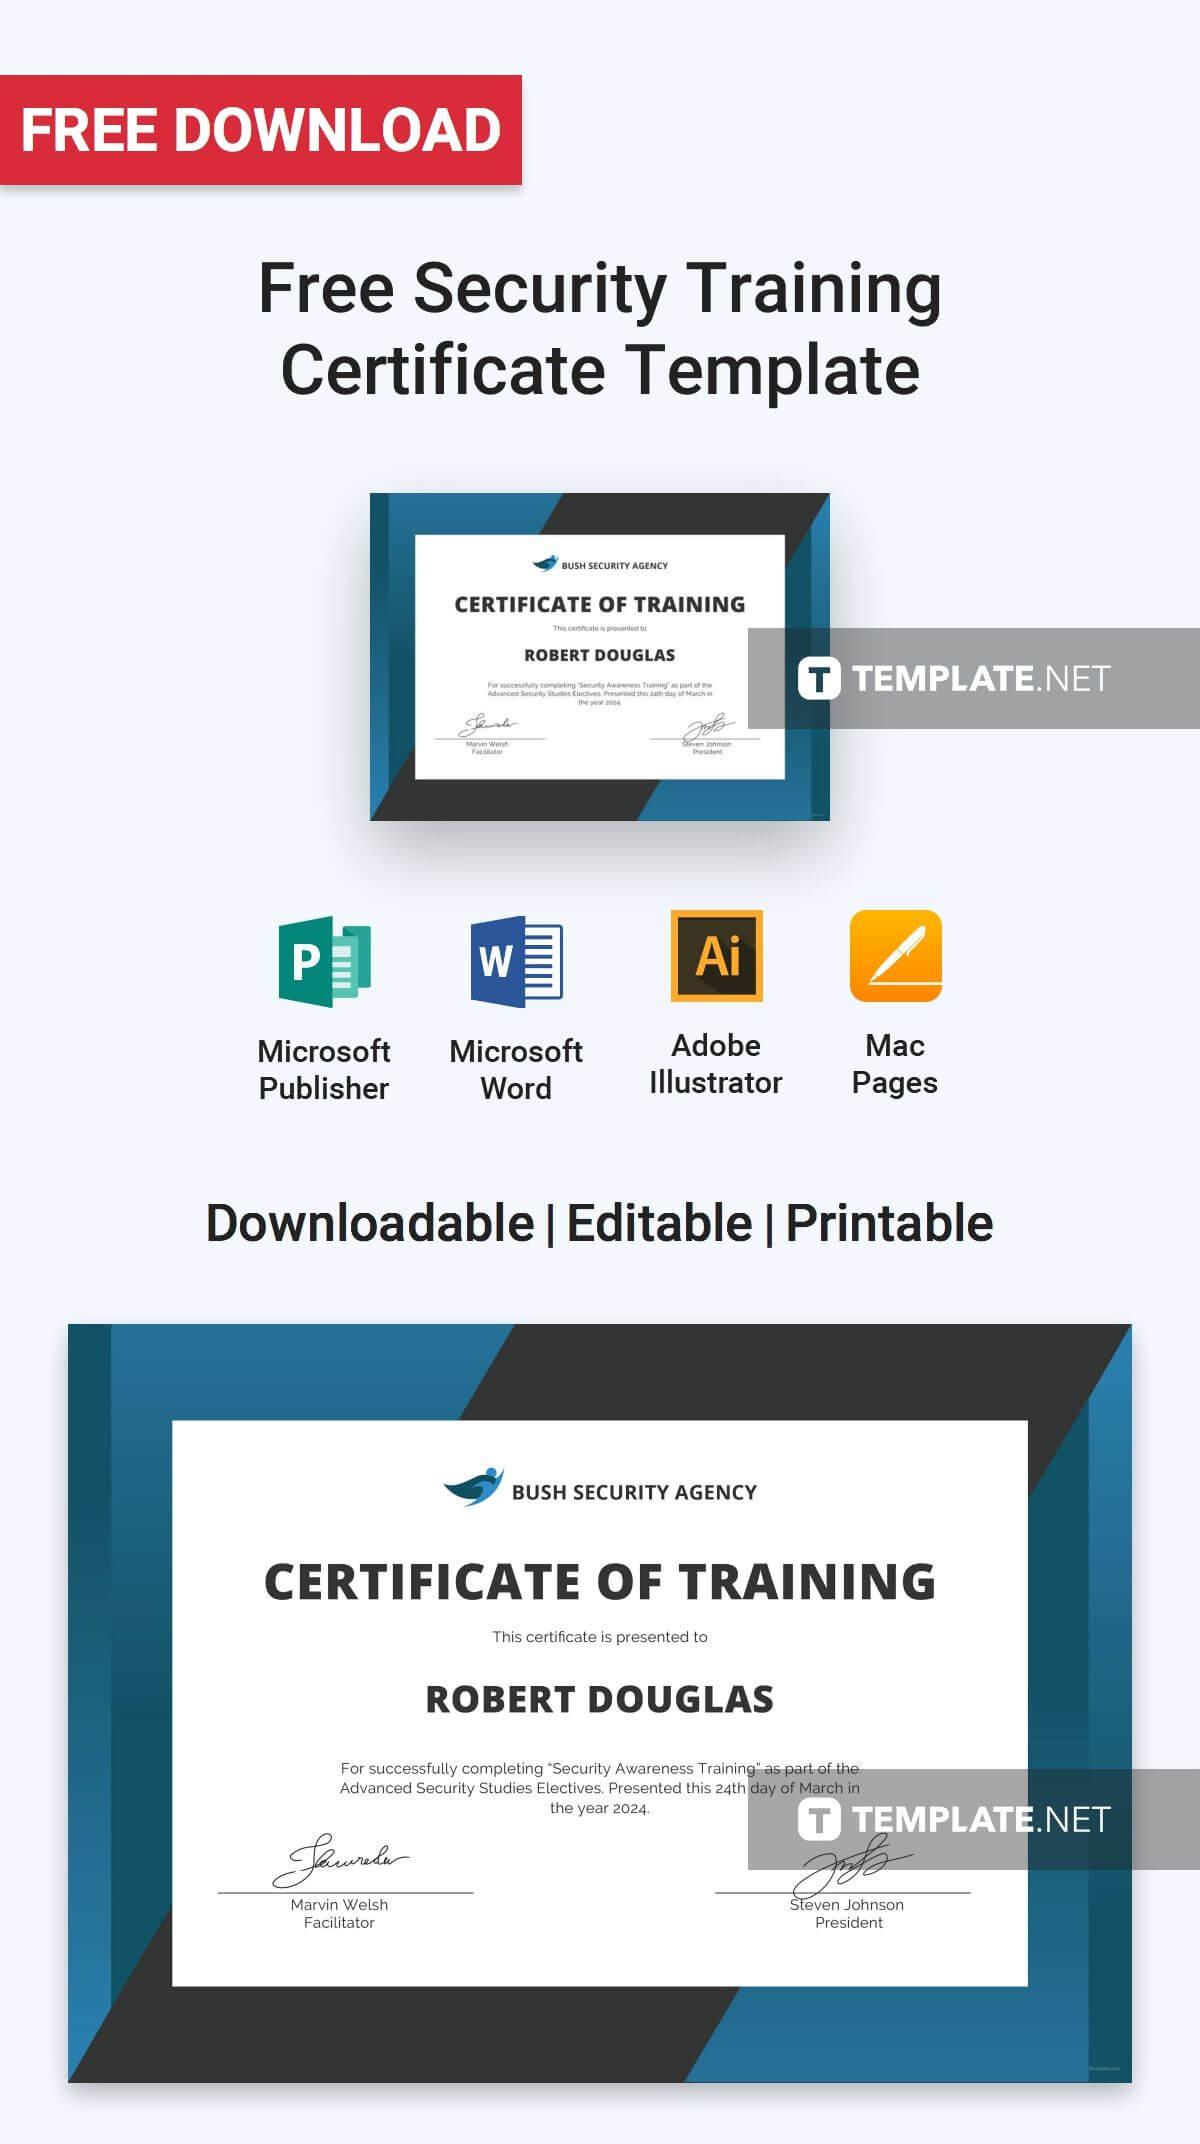 Free Security Training Certificate | Certificate Templates regarding Certificate Authority Templates